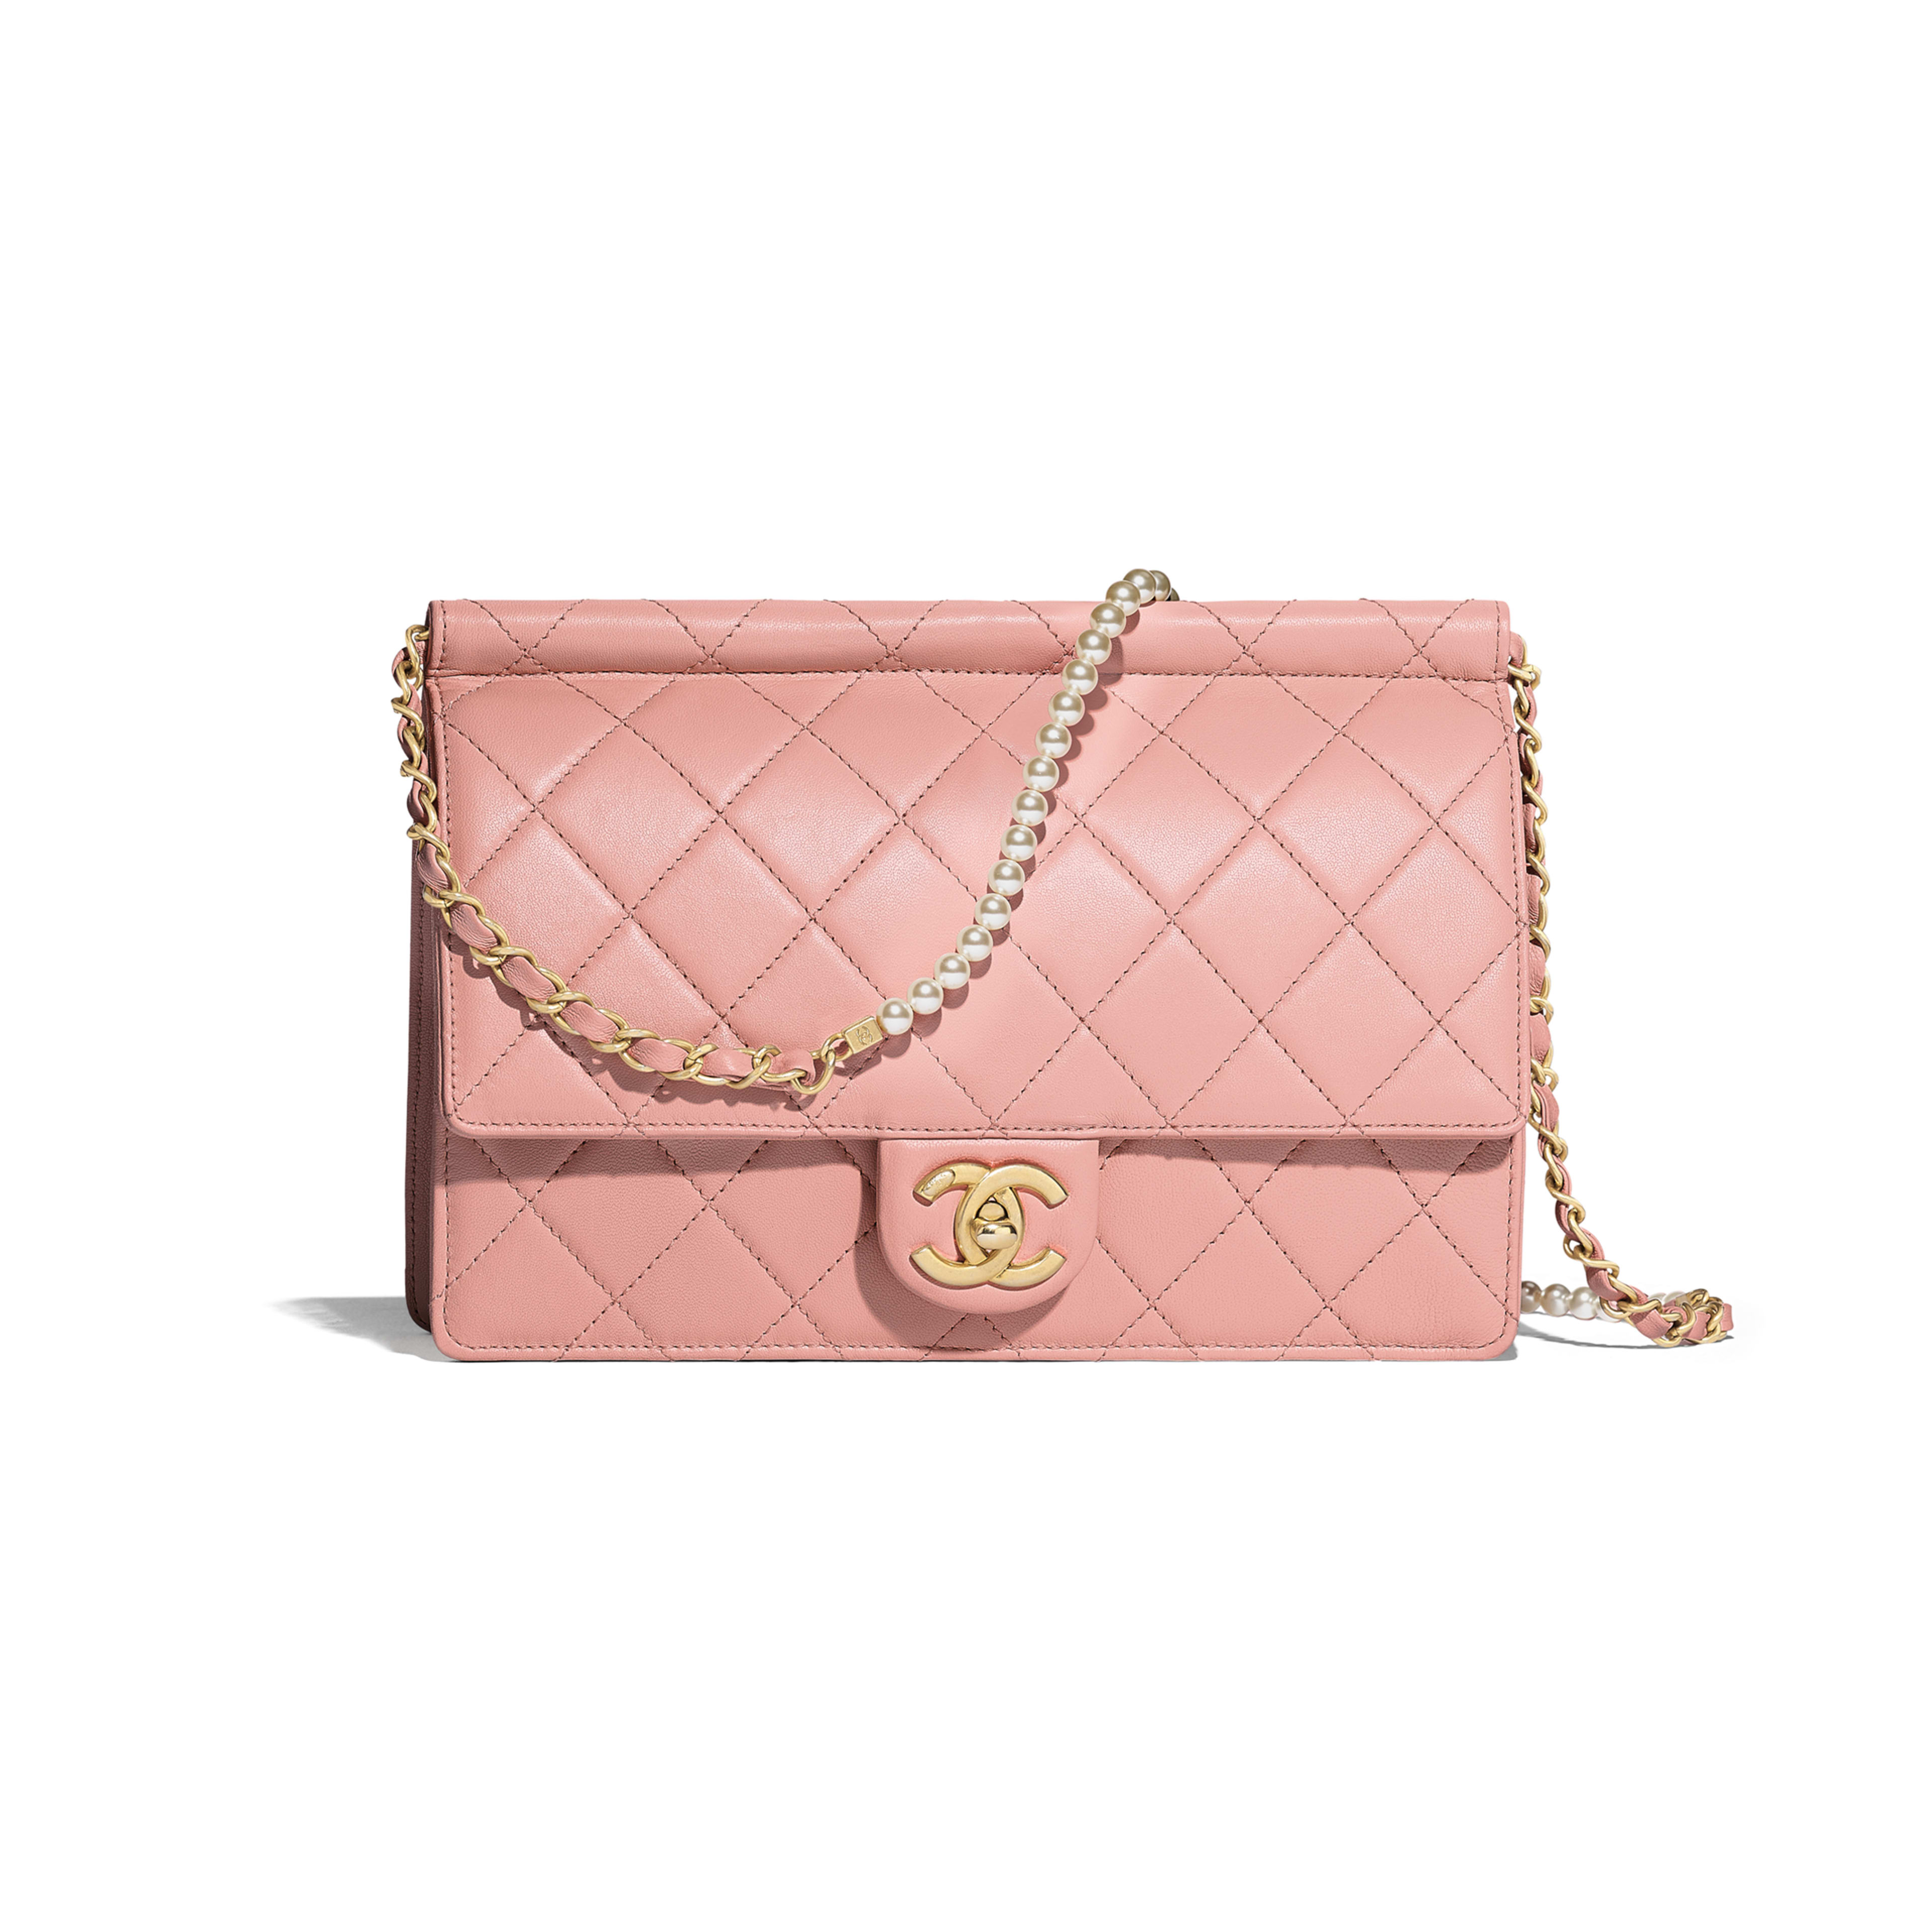 Flap Bag - Pink - Lambskin, Imitation Pearls & Gold-Tone Metal - Default view - see full sized version